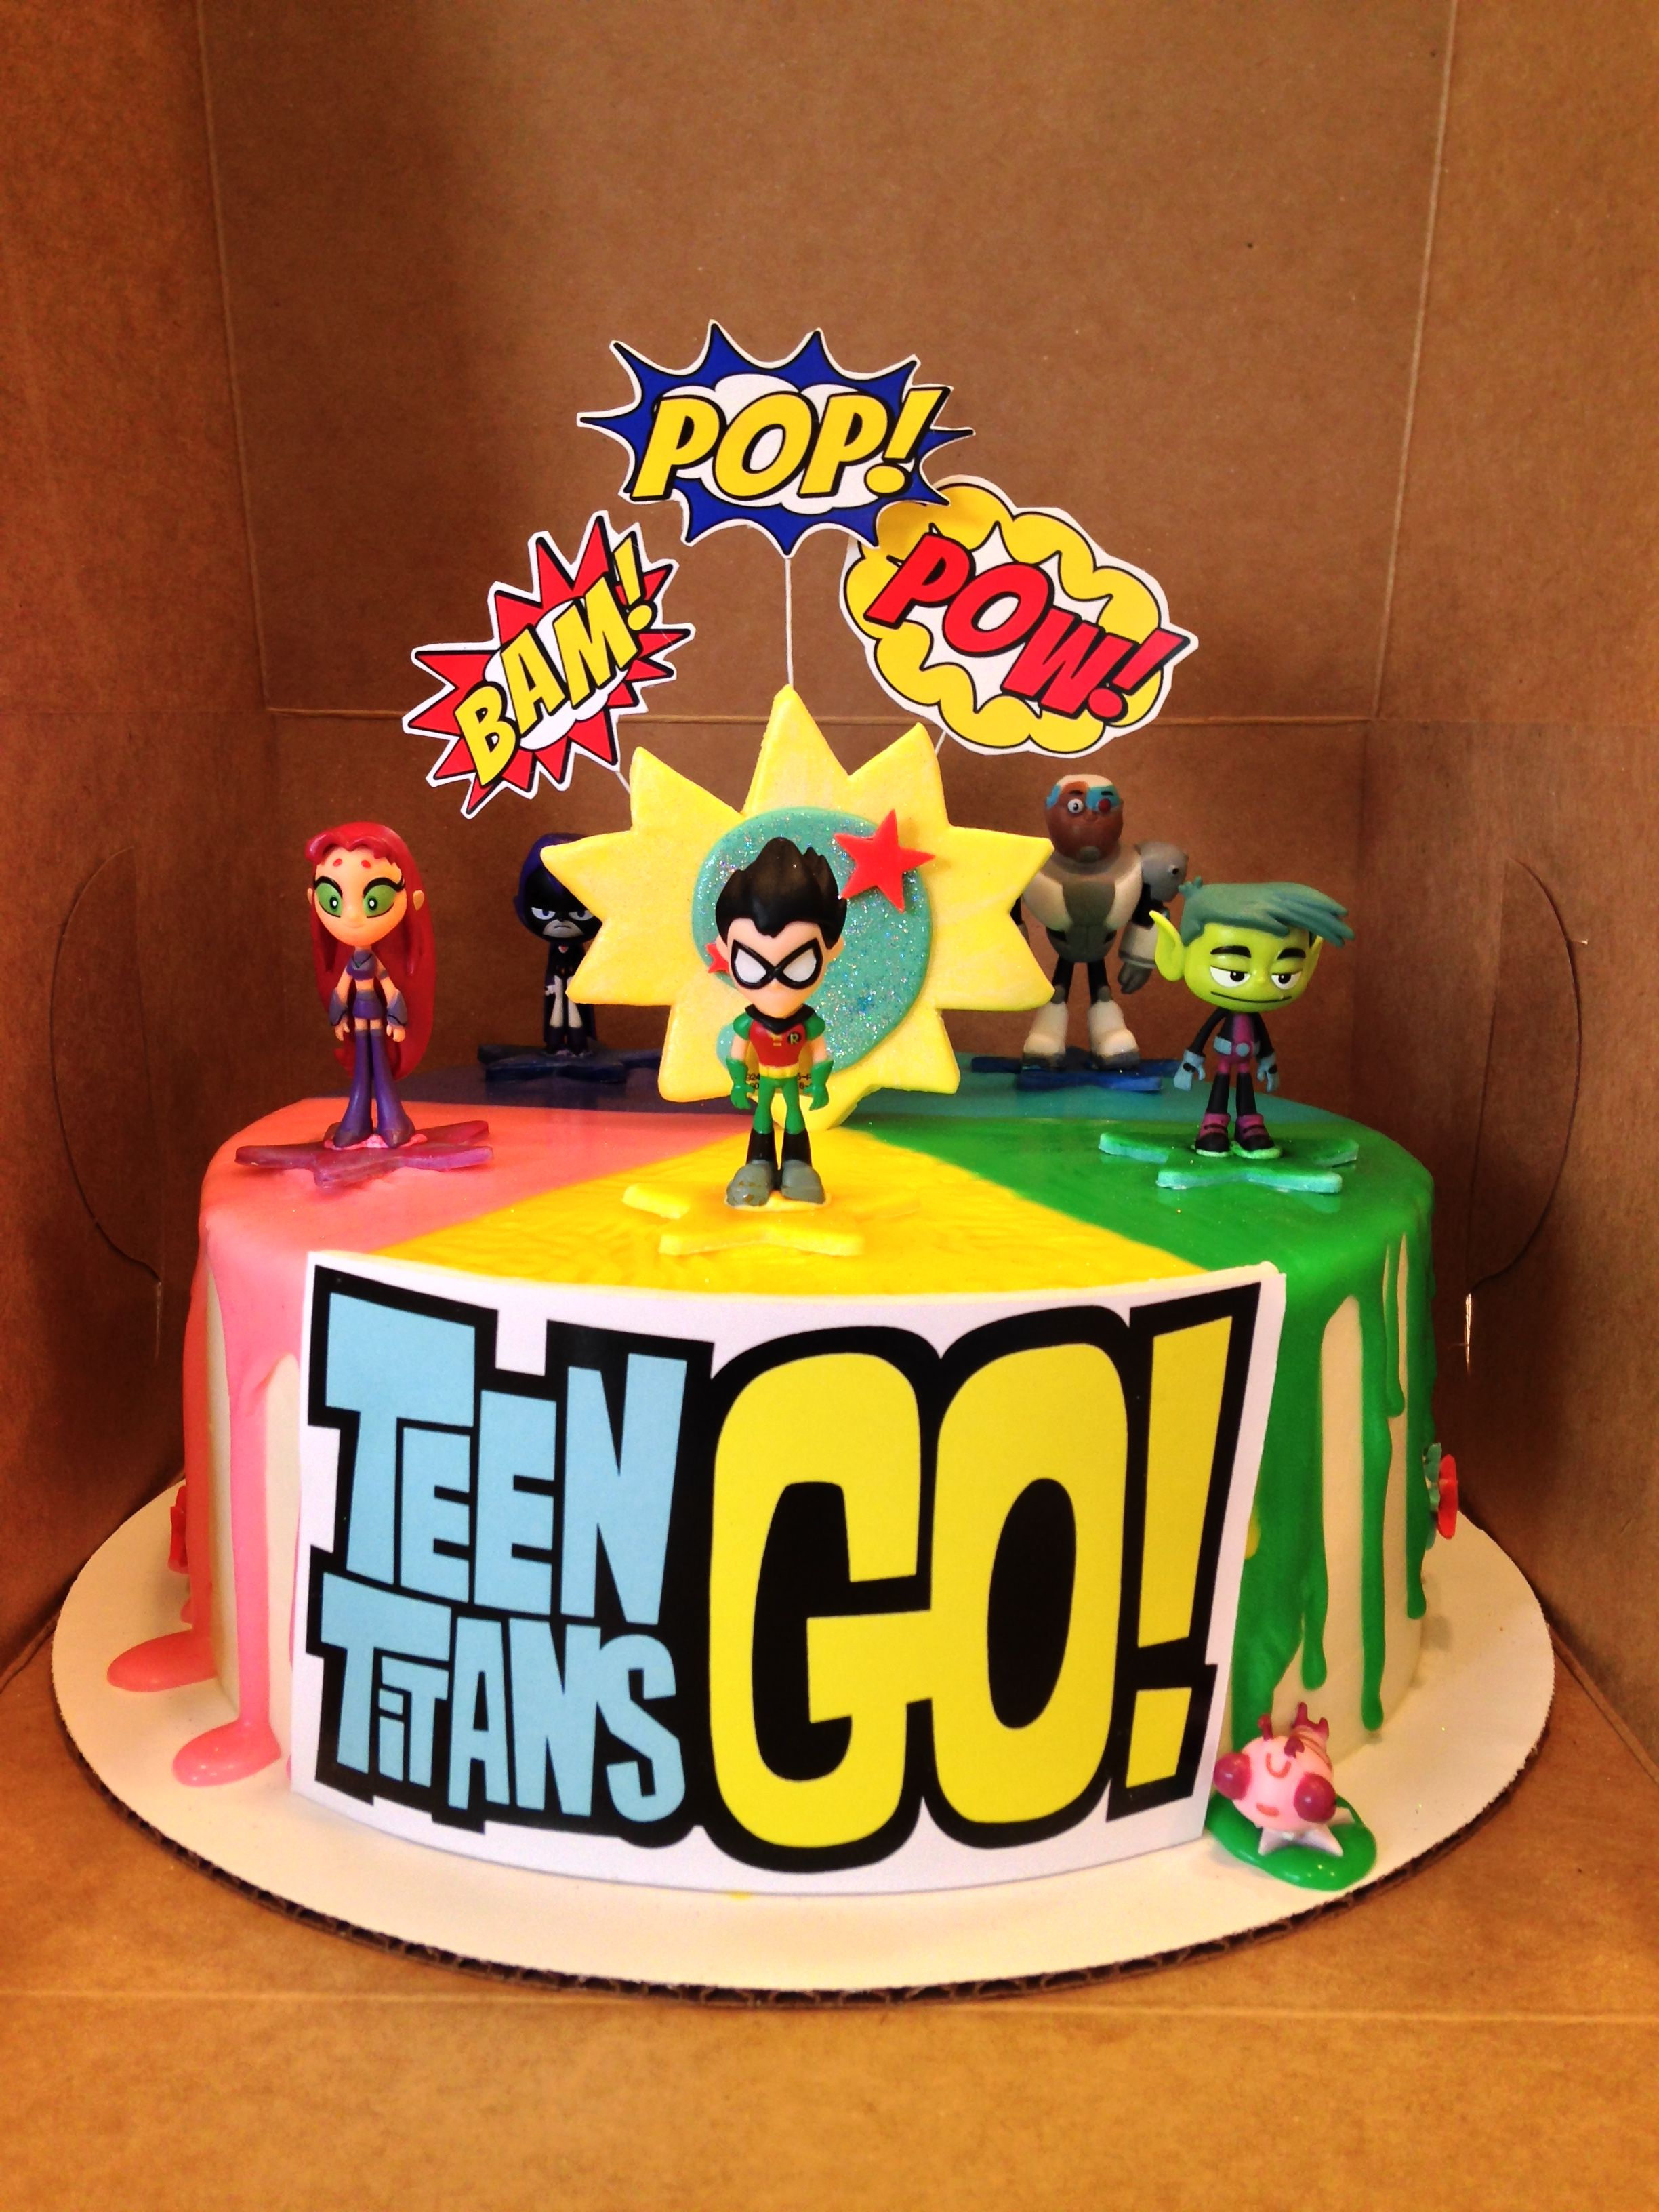 Teen Titans Go cake   Party / gathering ideas in 2019   Teen Titans ...